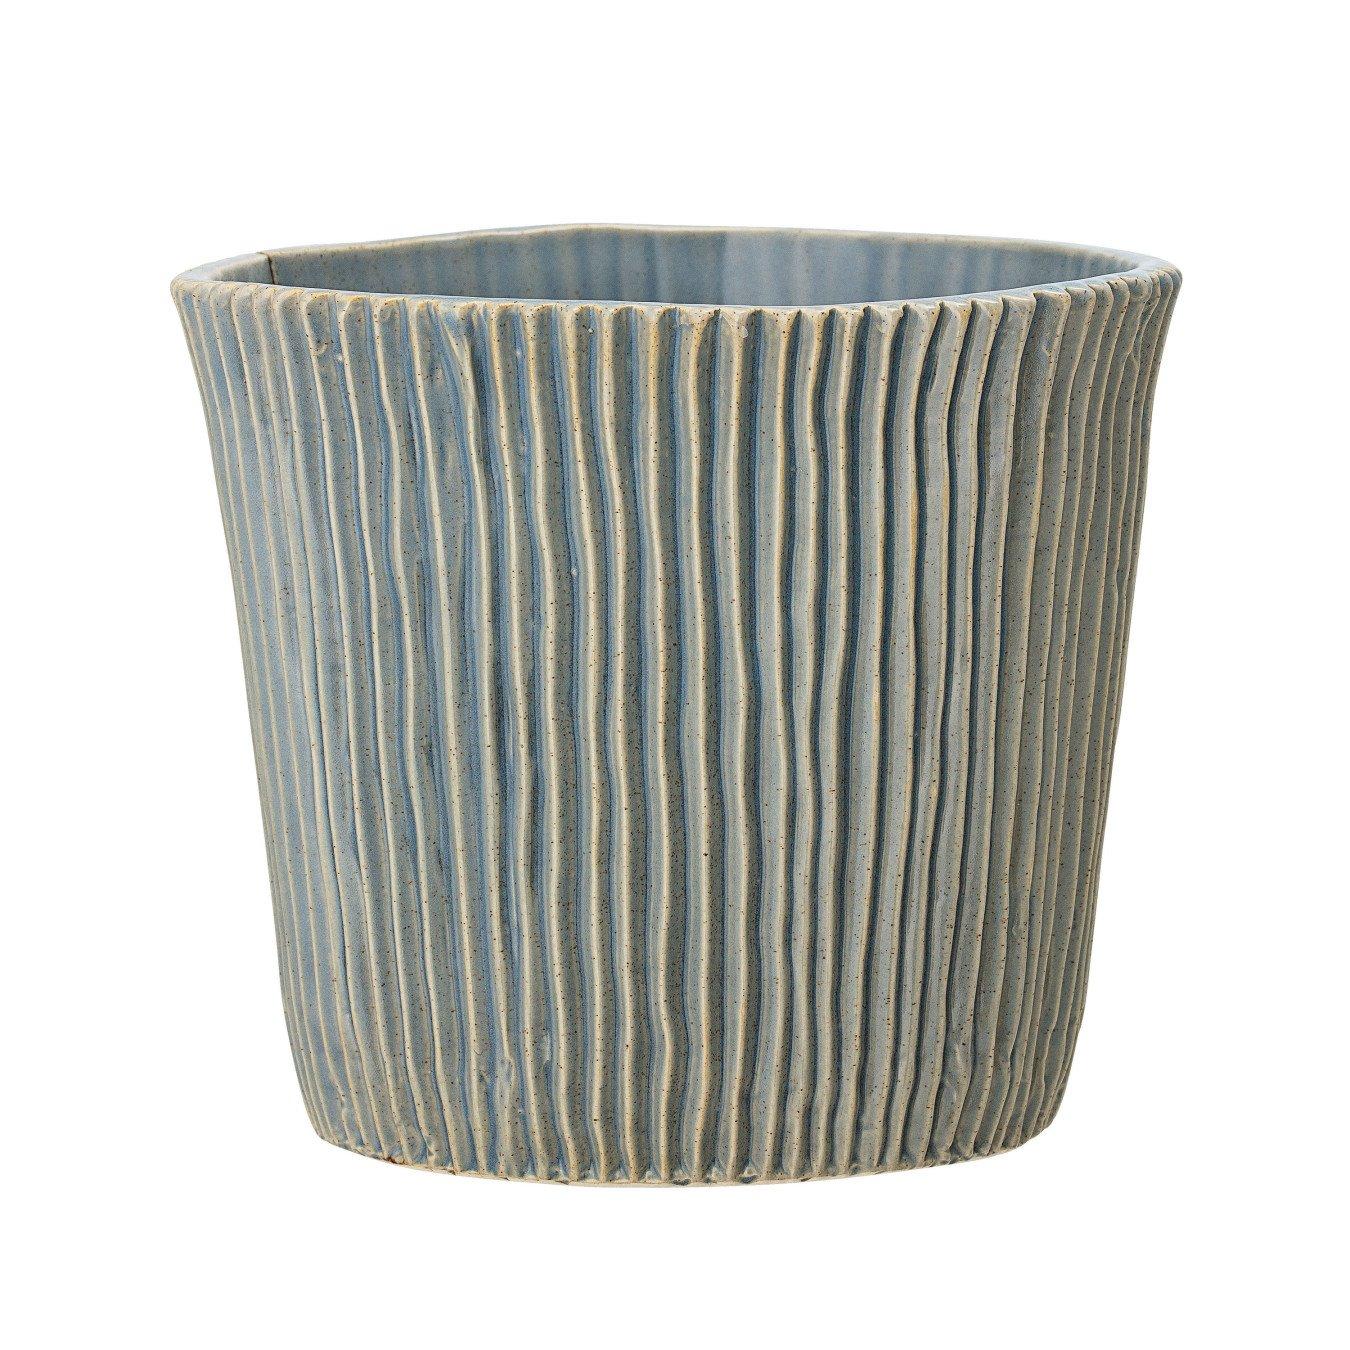 Large Fluted Blue Stoneware Flower Pot